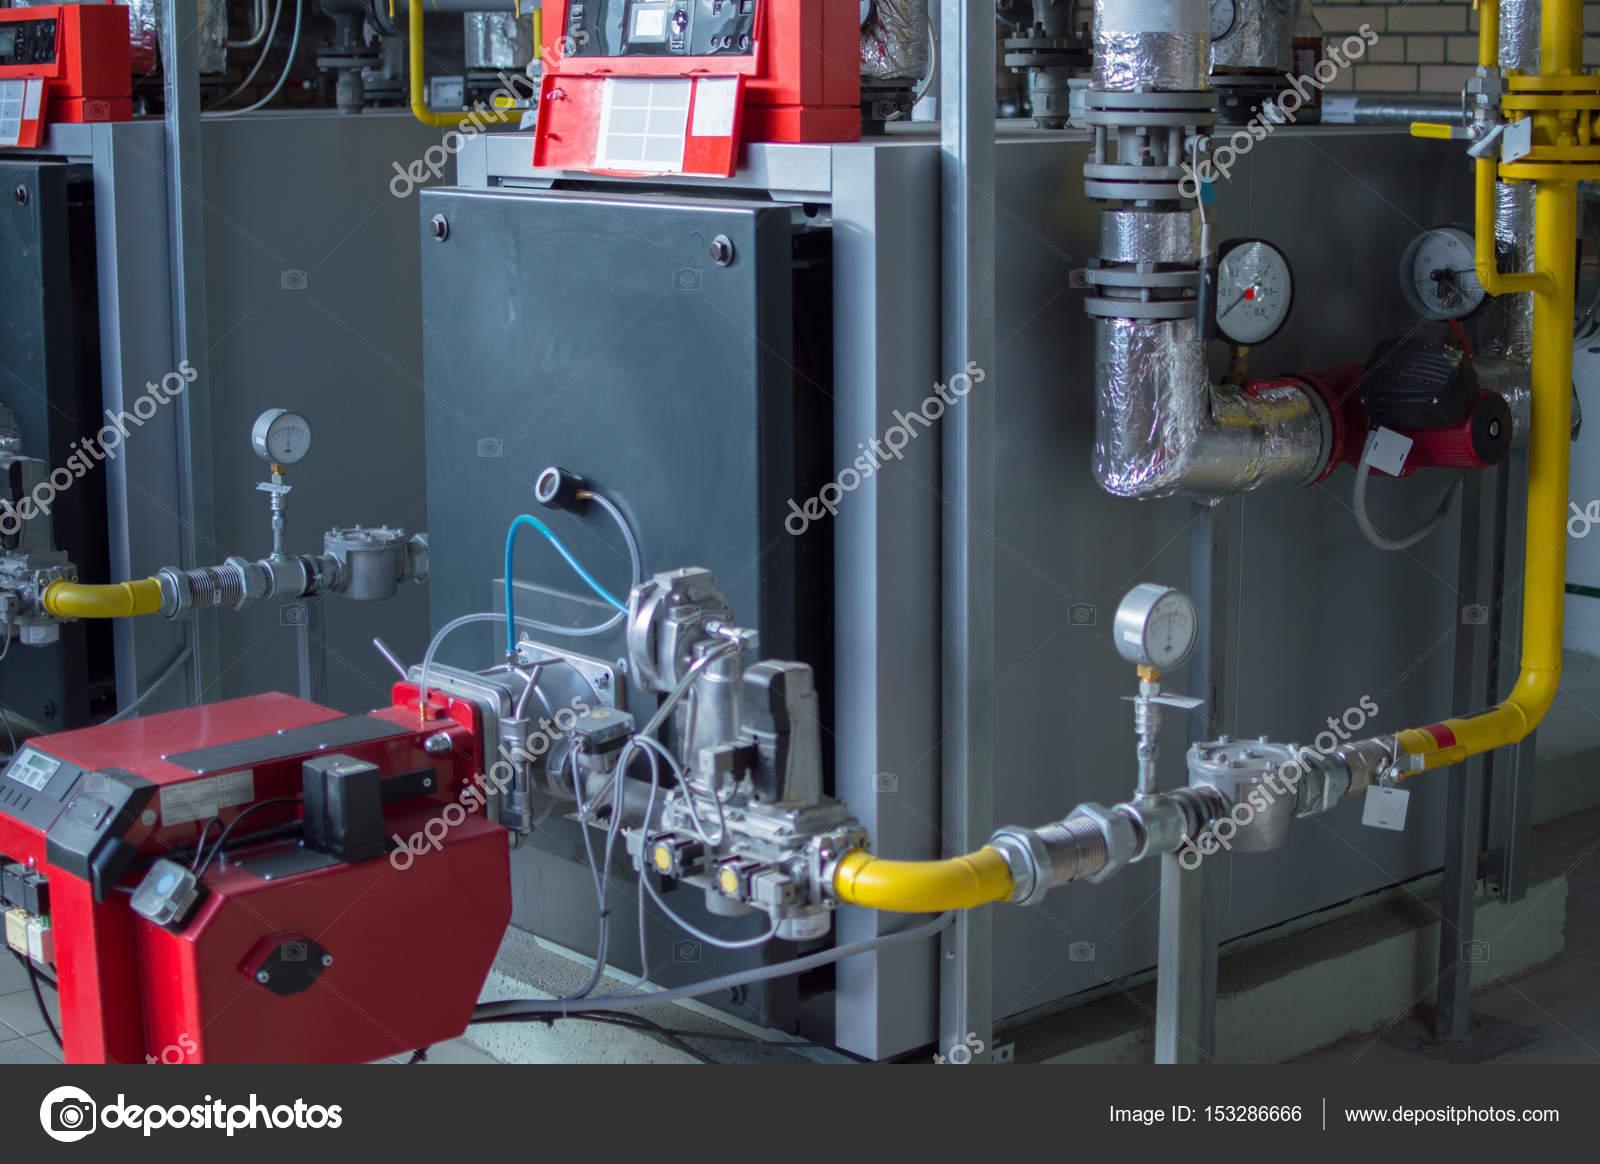 Caldeiras A G S Industrial Moderno De Alta Pot Ncia Com Queimadores